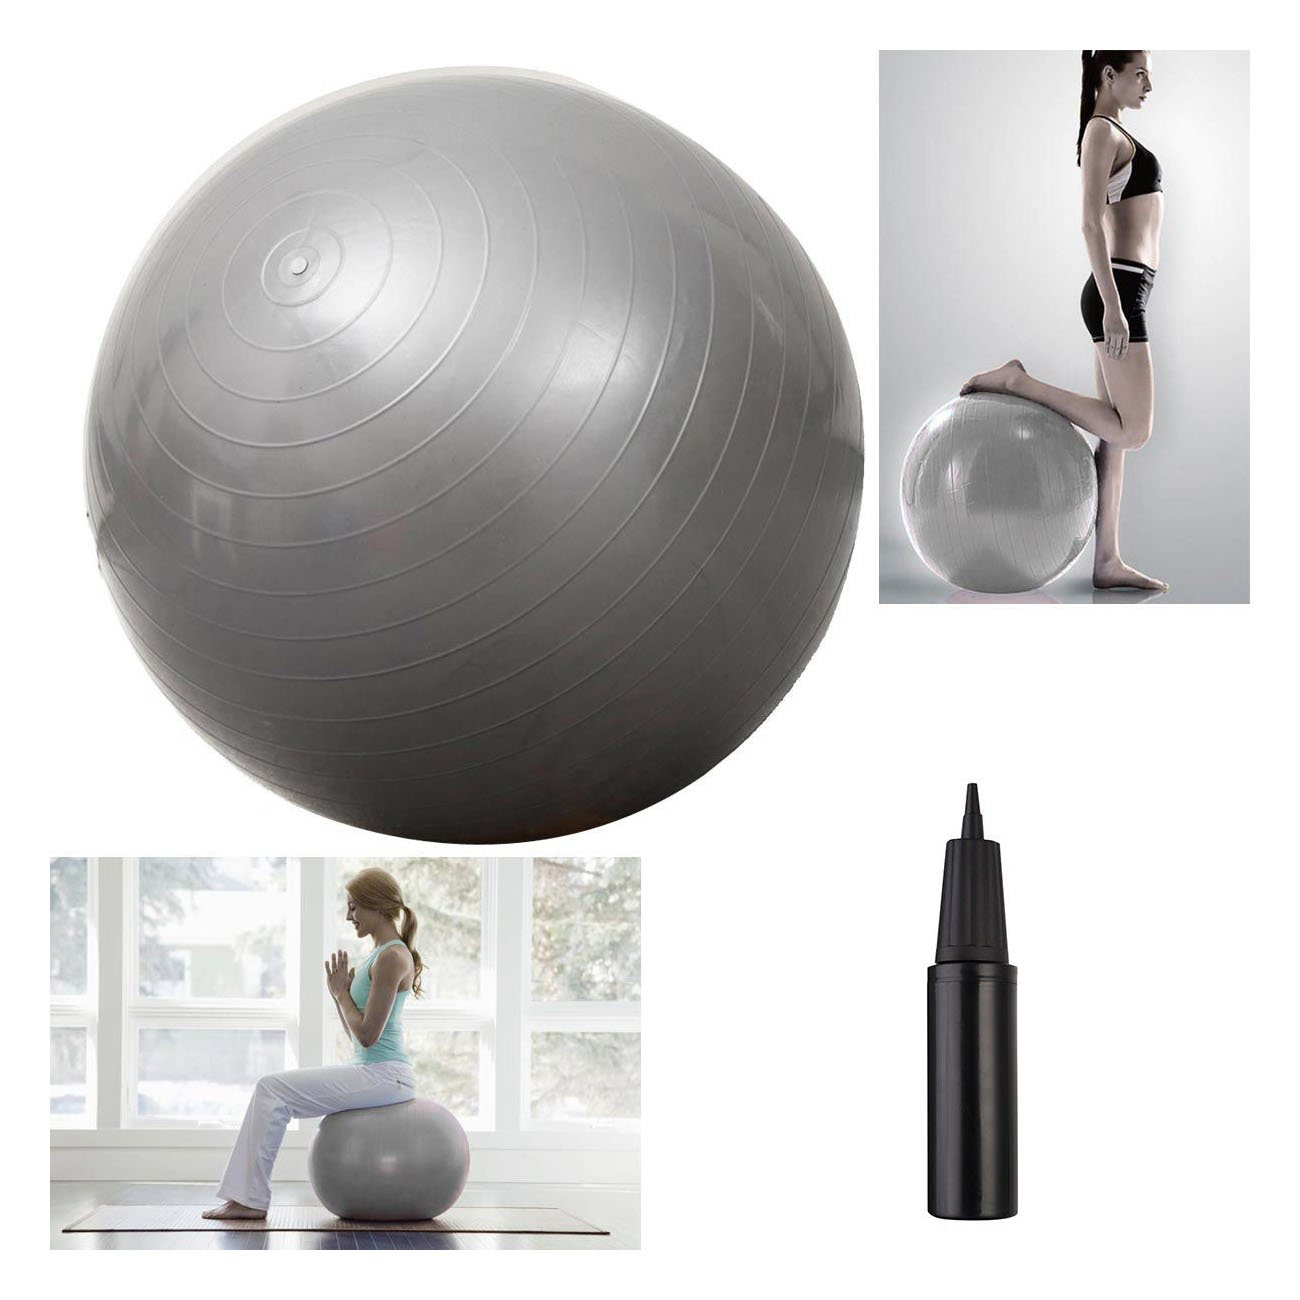 75cm Silver Yoga Ball Stability Pilates Ball Fitness Equipment Exercise Gym Ball